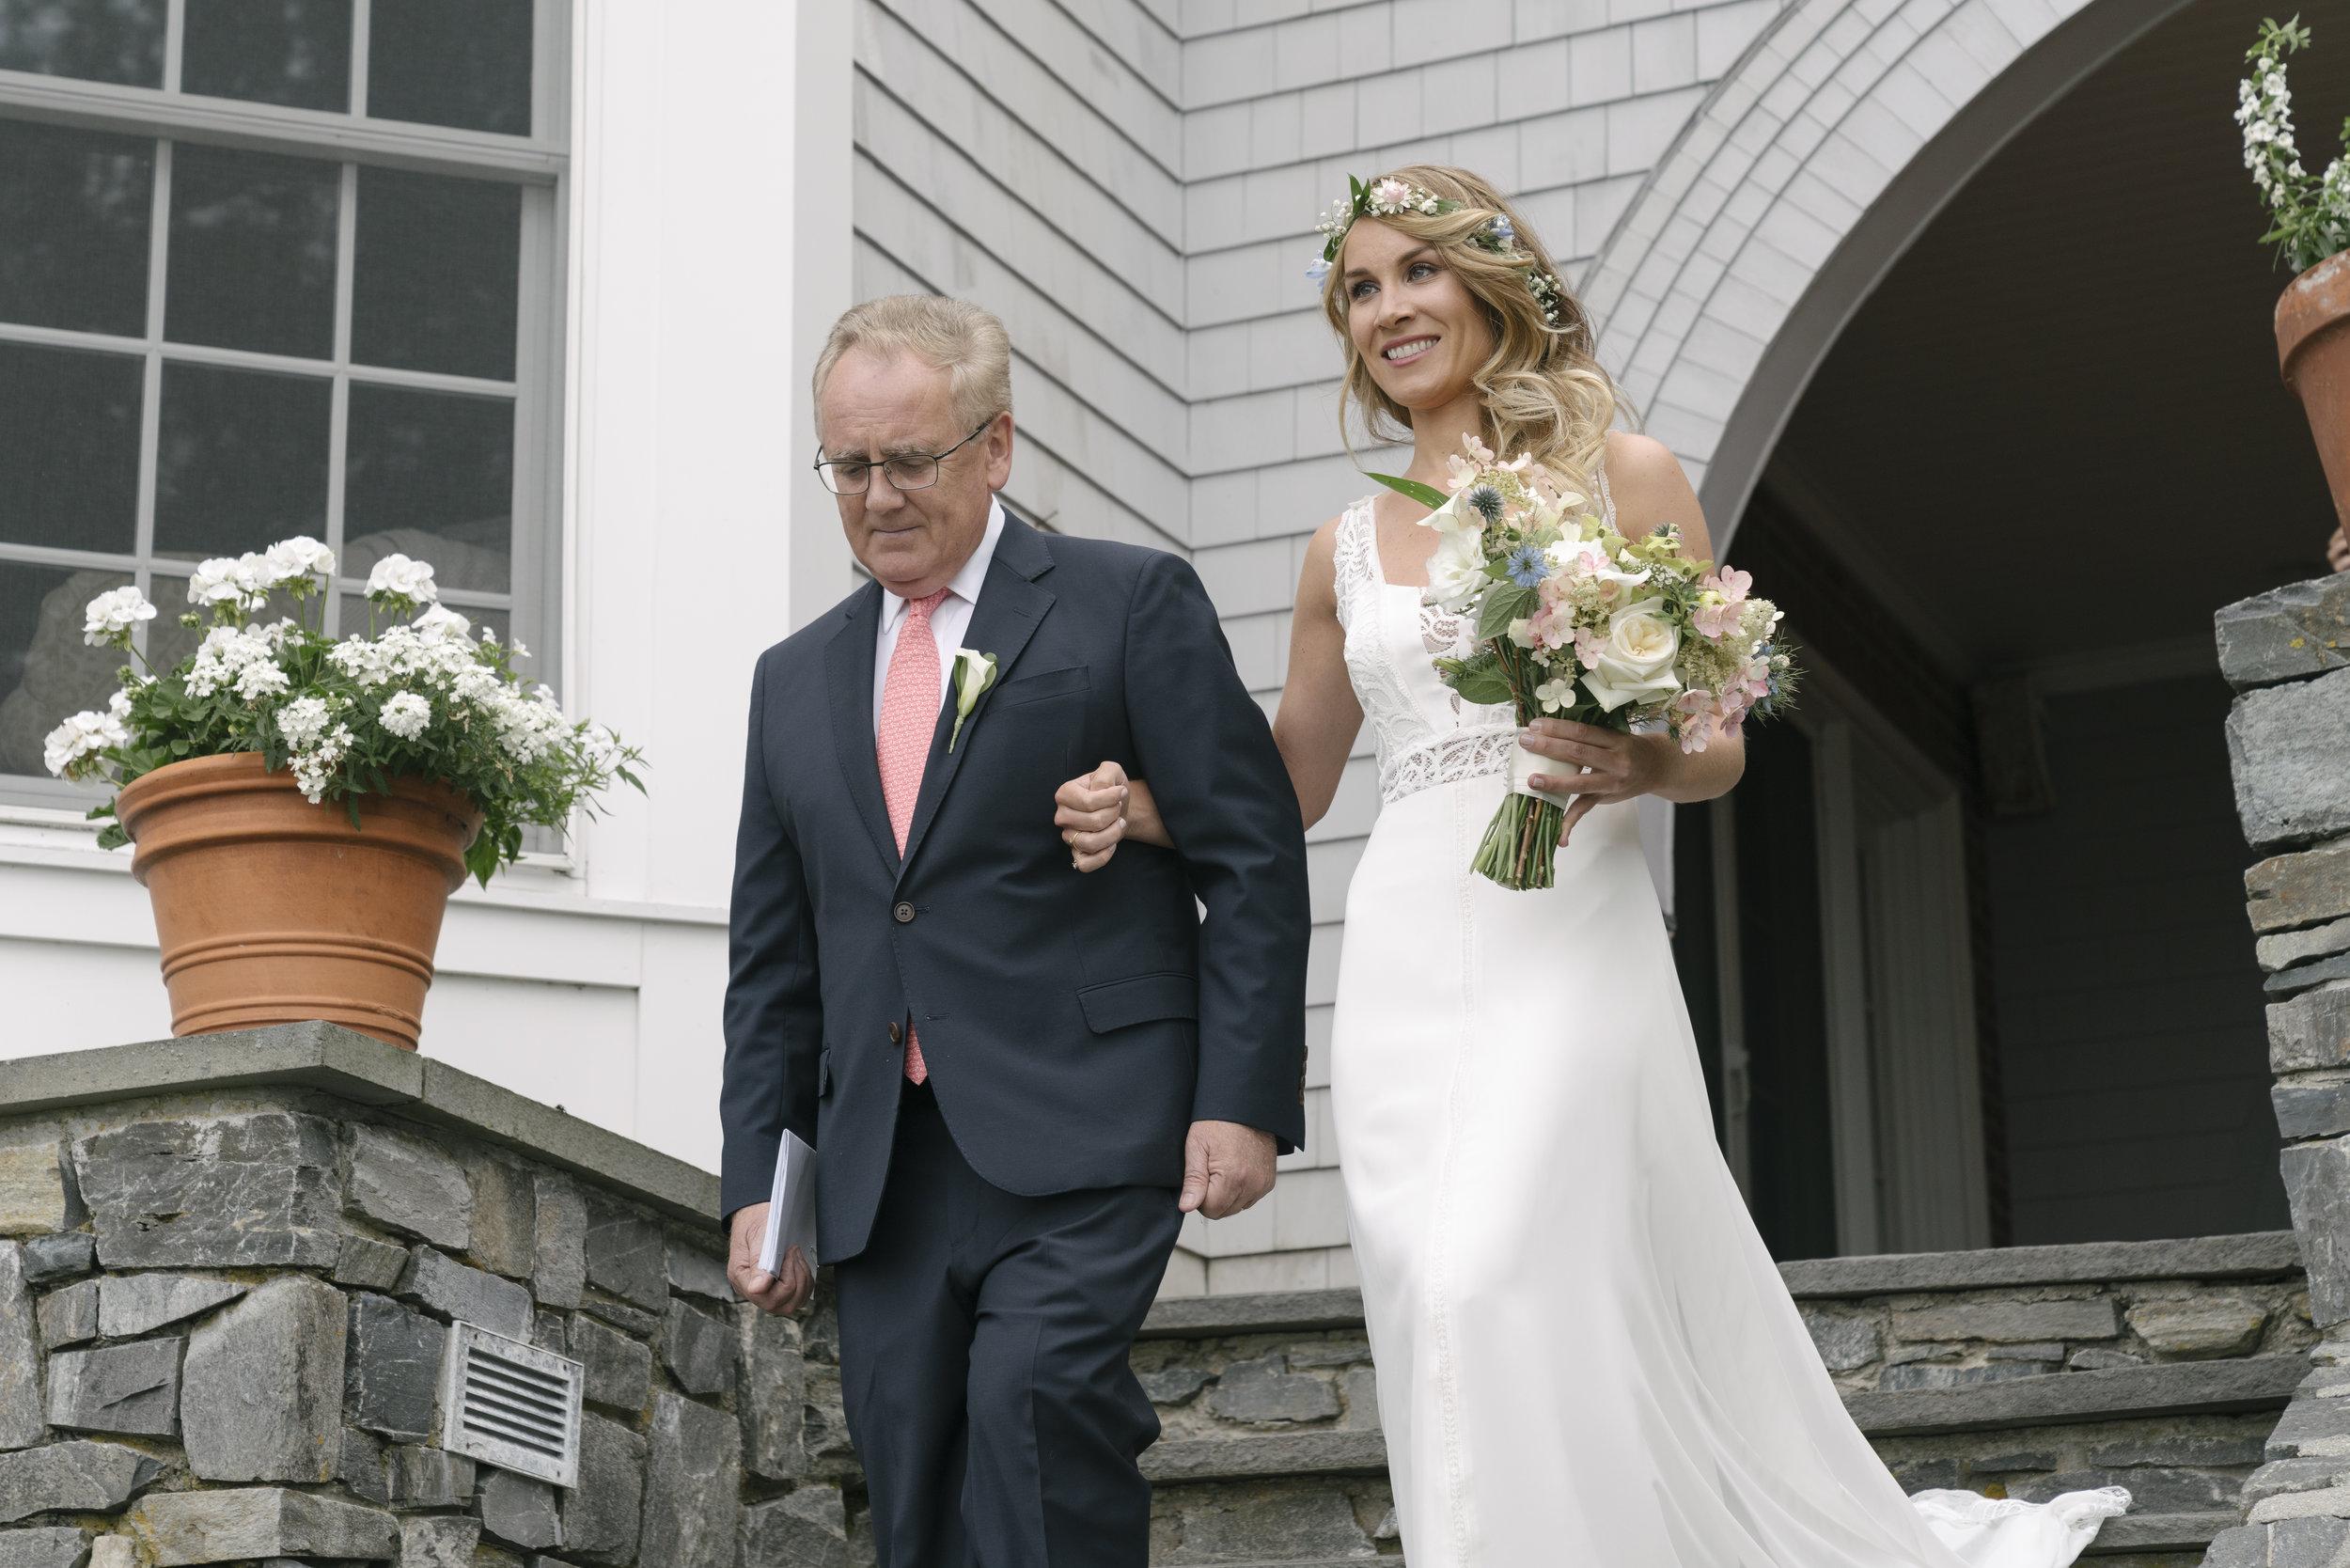 Wedding_LuisaDaniel_Master_JPGs (67 of 421).jpg